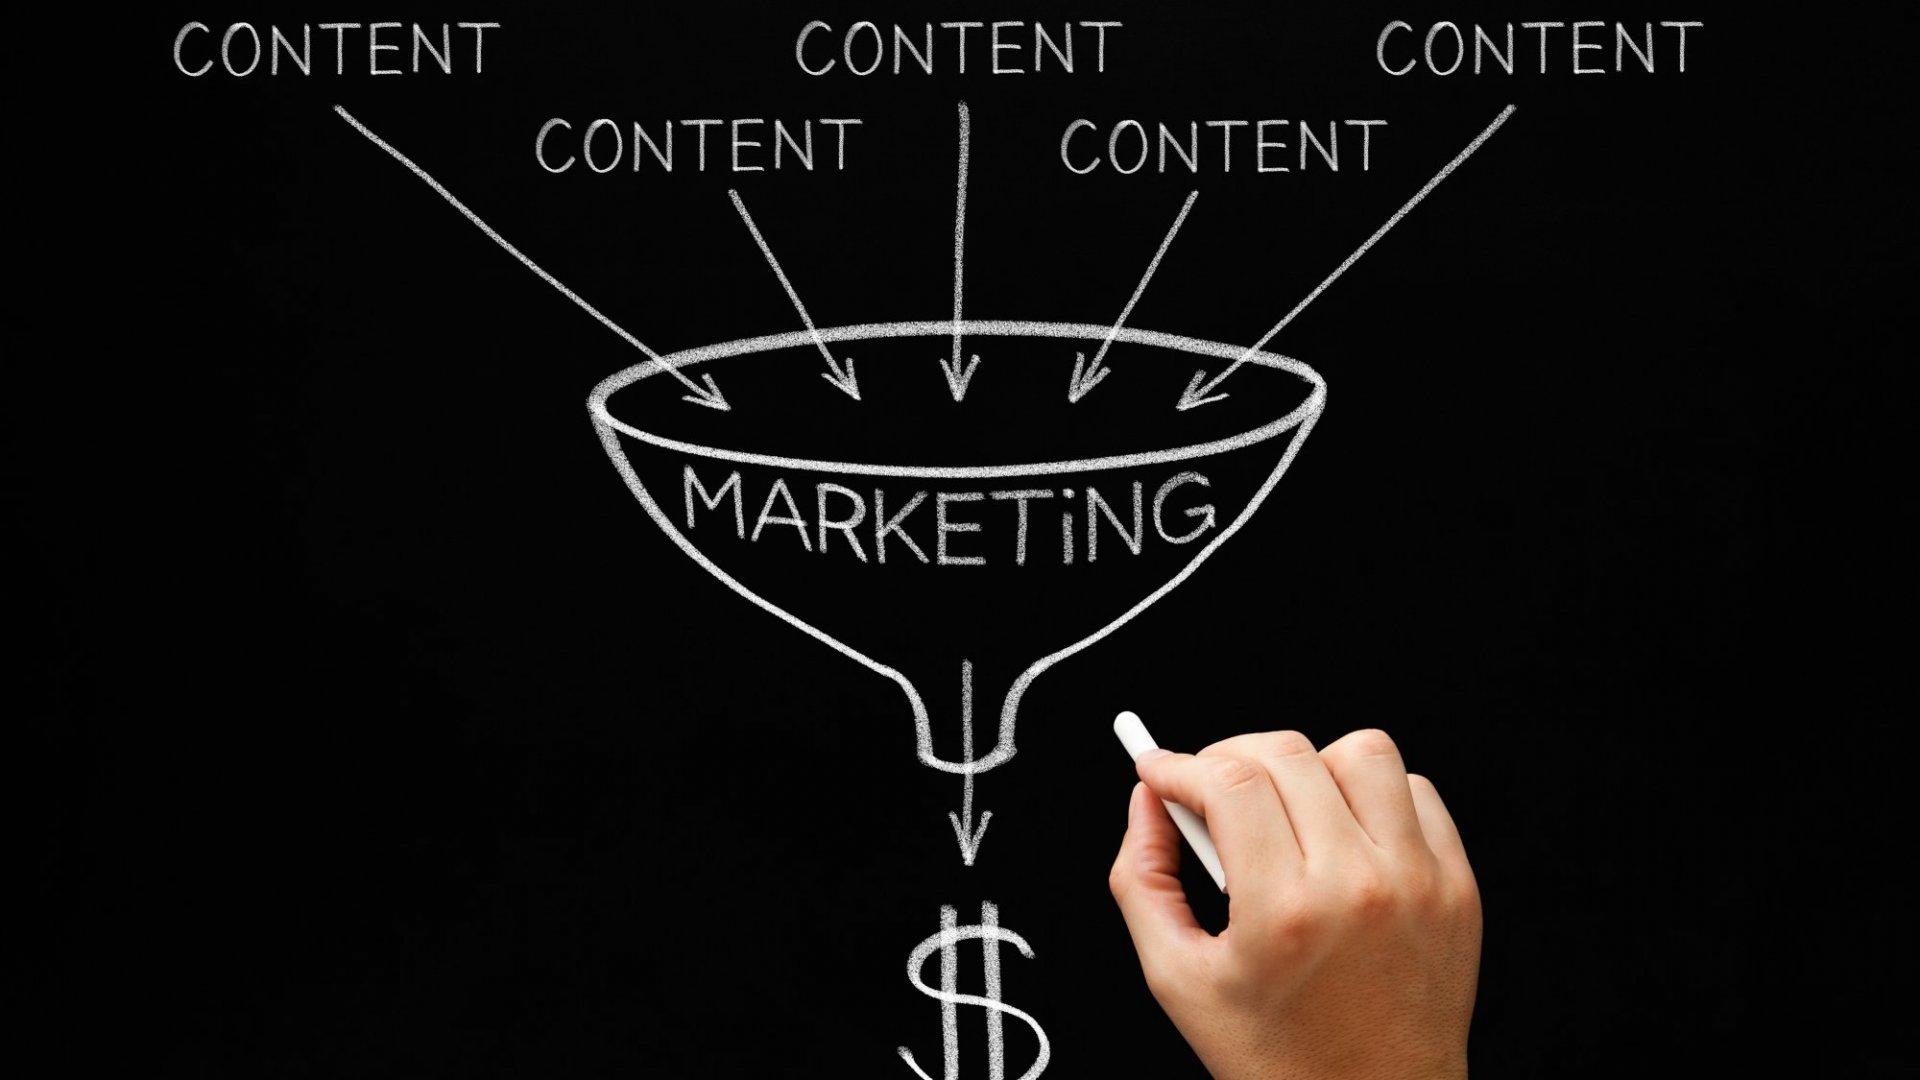 Why Franchises Should Leverage Content Marketing